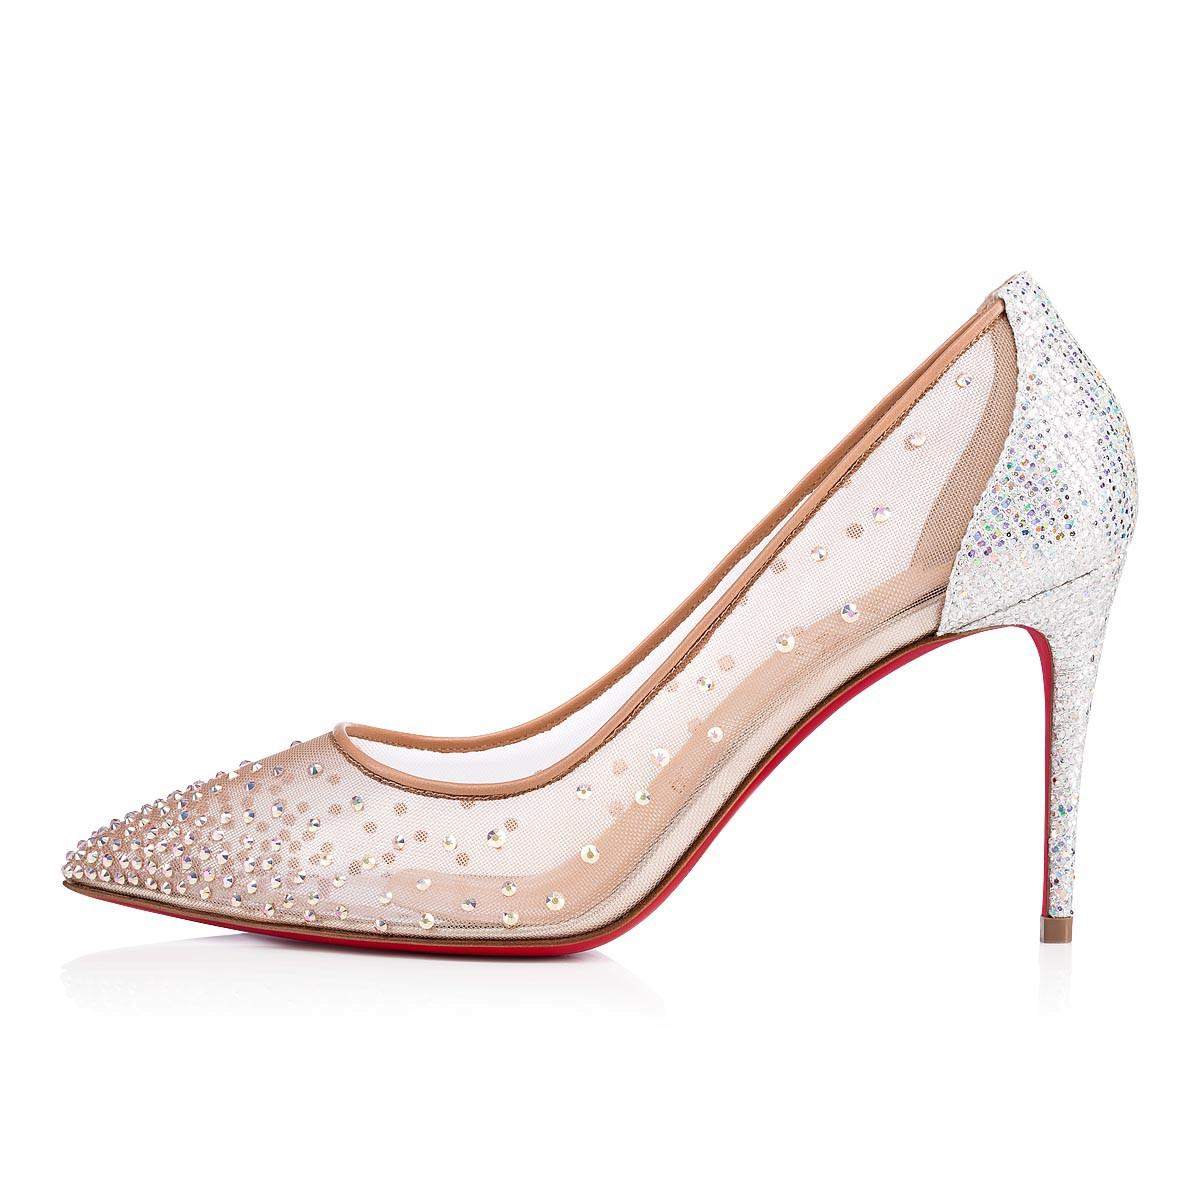 鞋履 - Follies Strass - Christian Louboutin